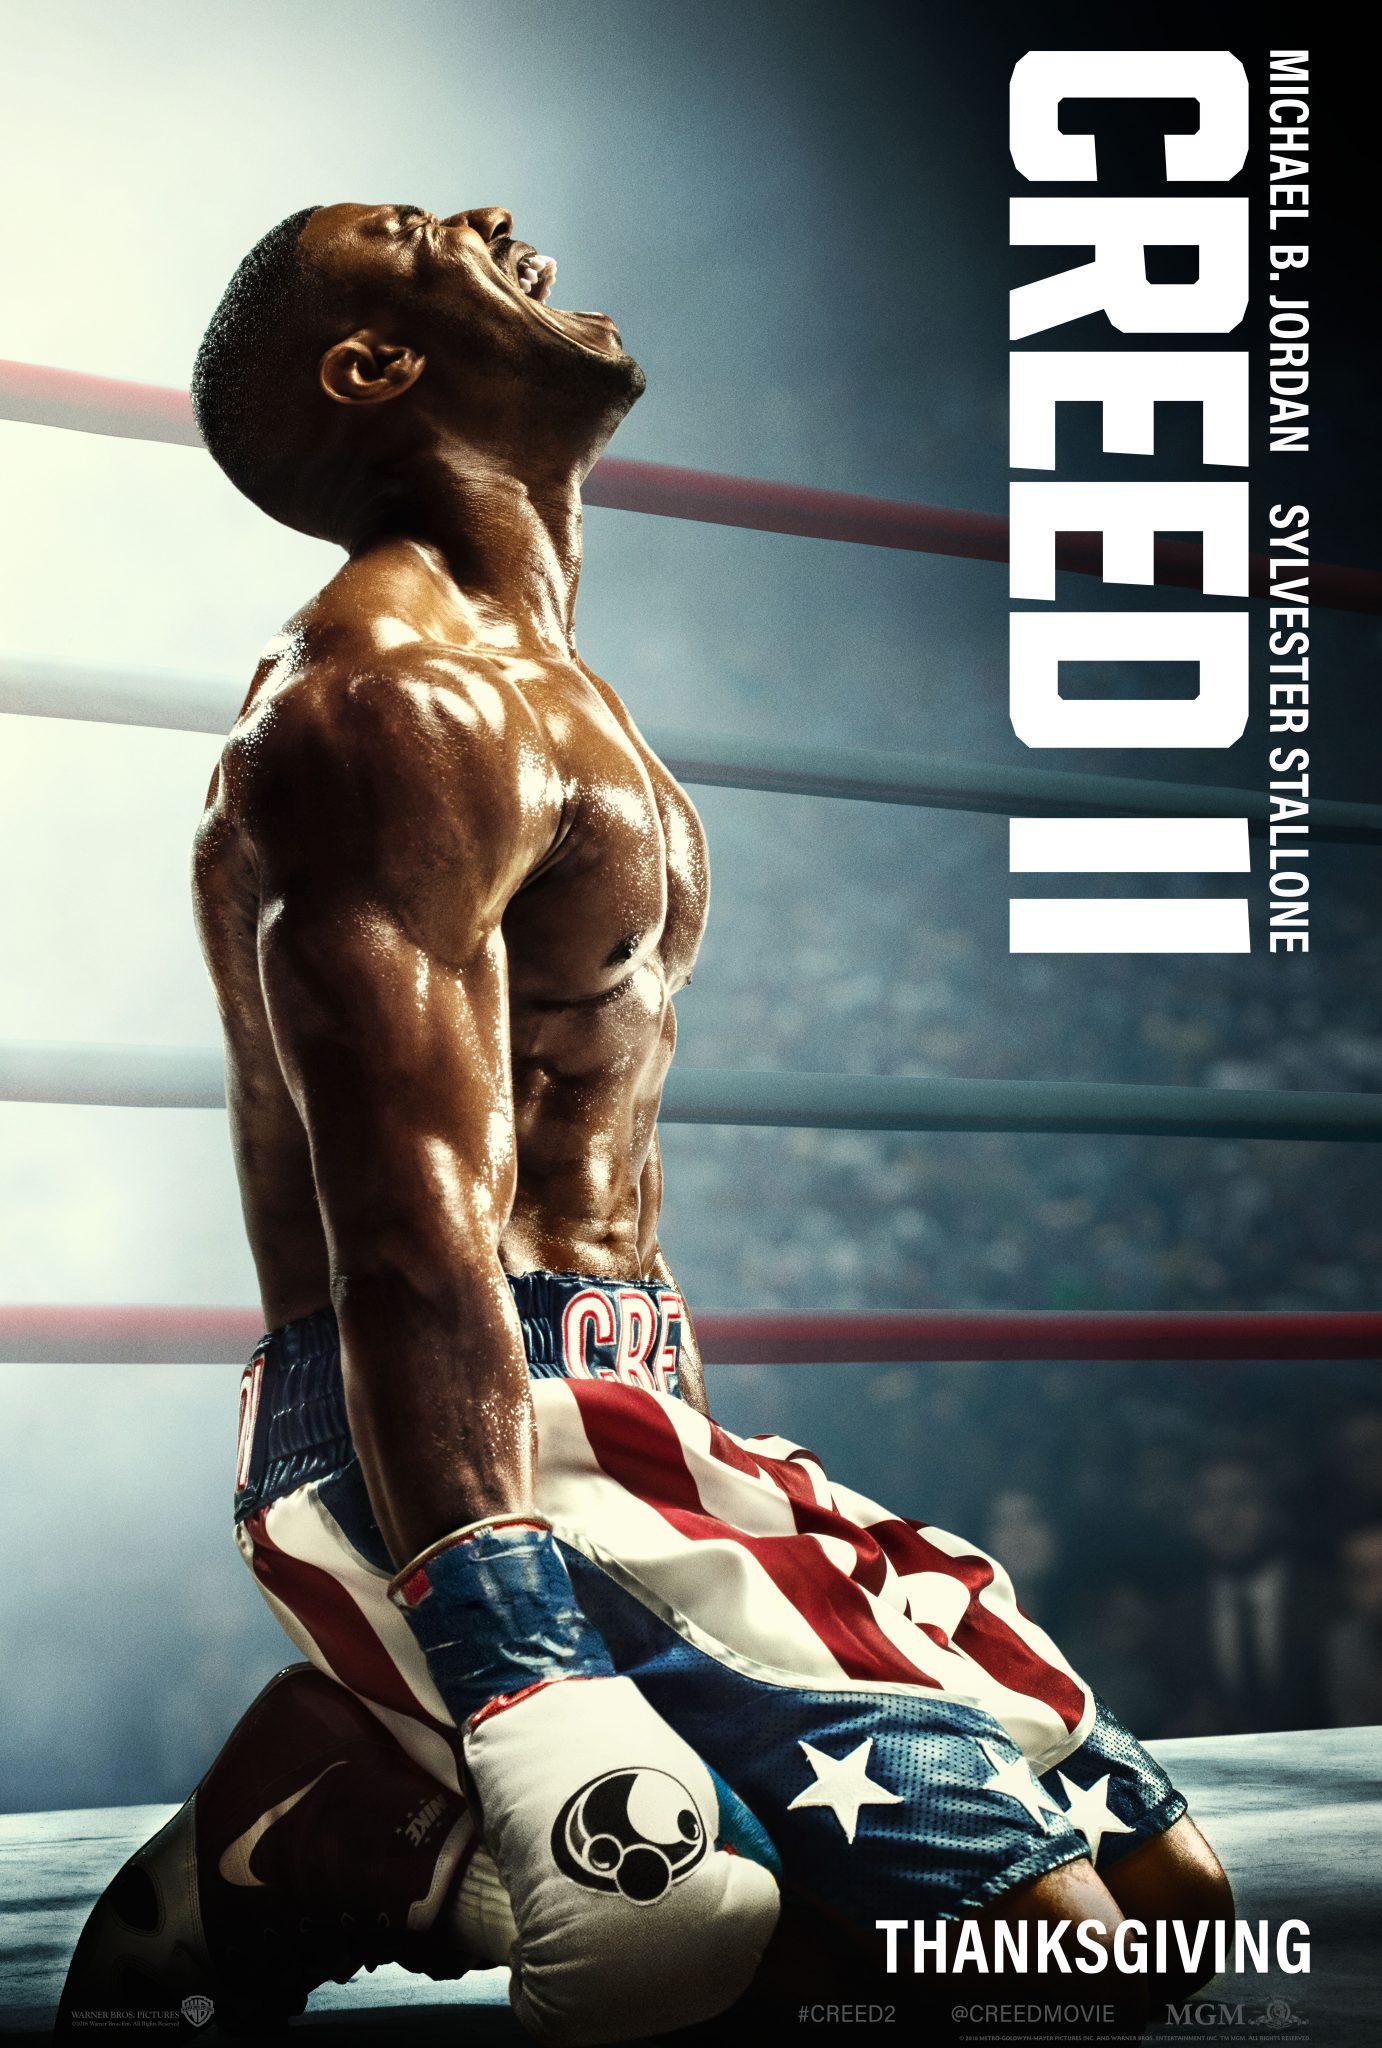 New Movie: Creed II